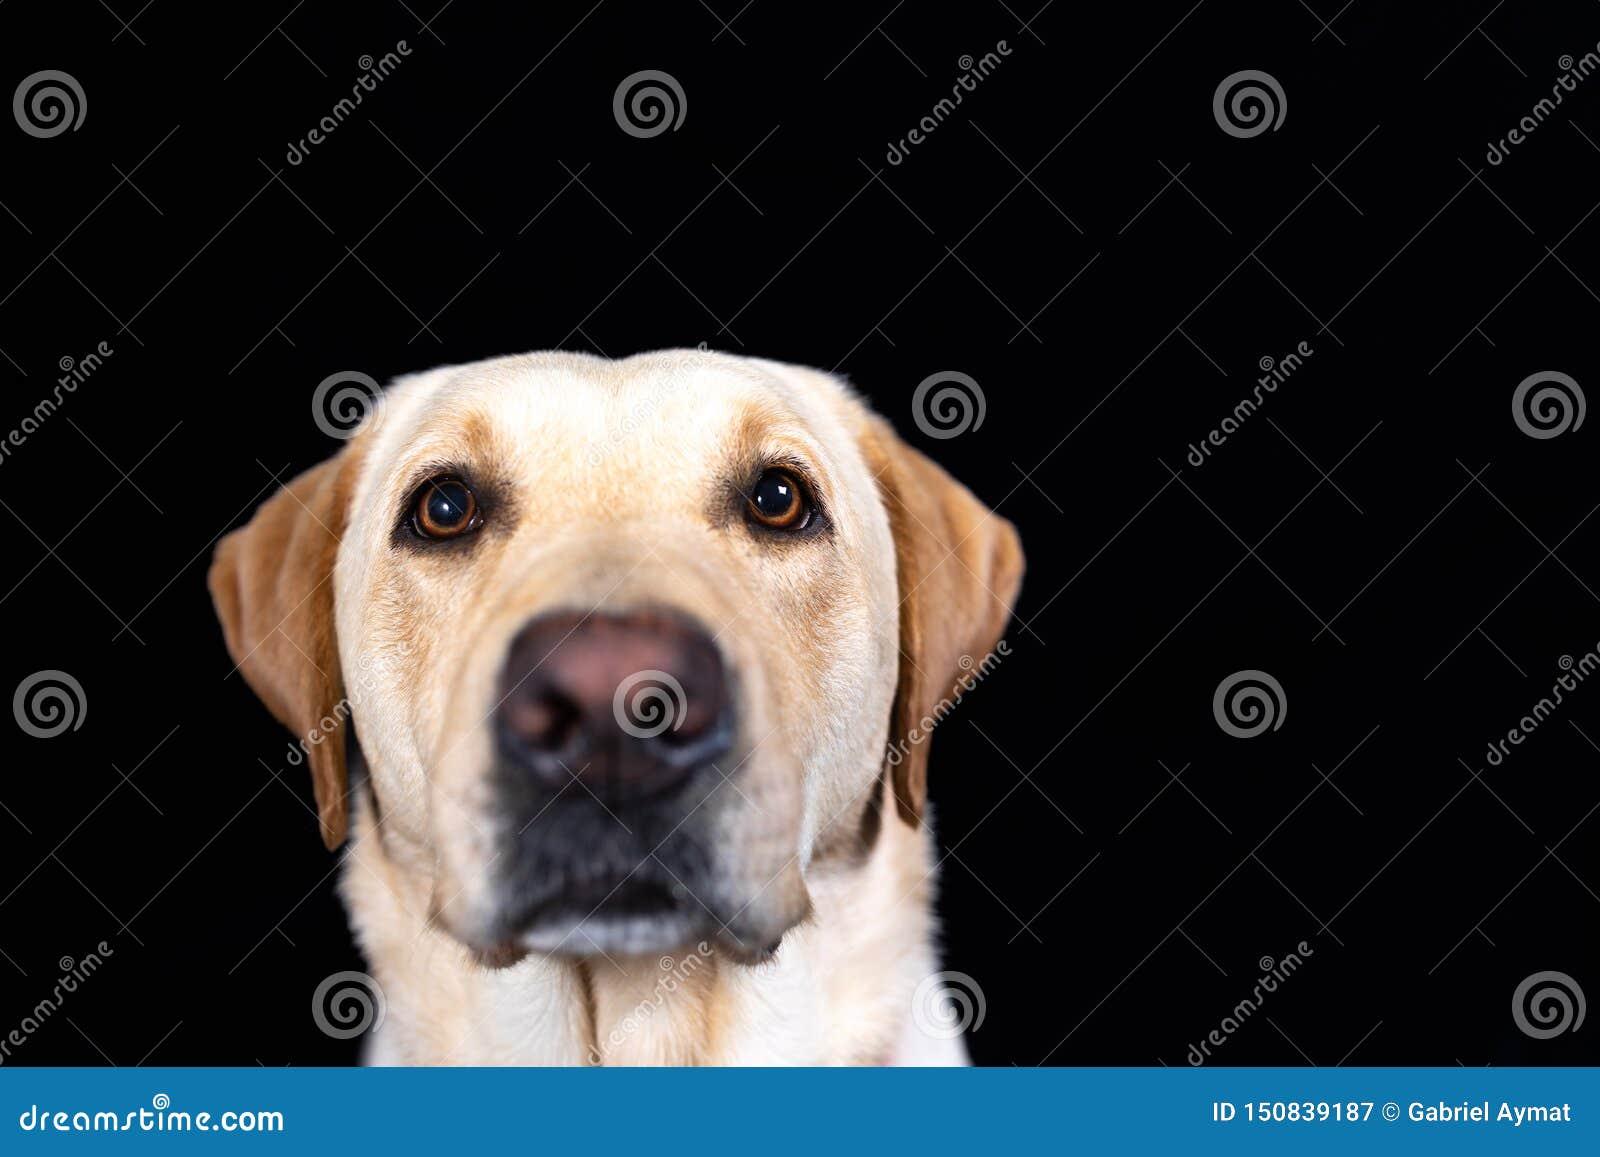 Snuit van labrador retriever op zwarte achtergrond